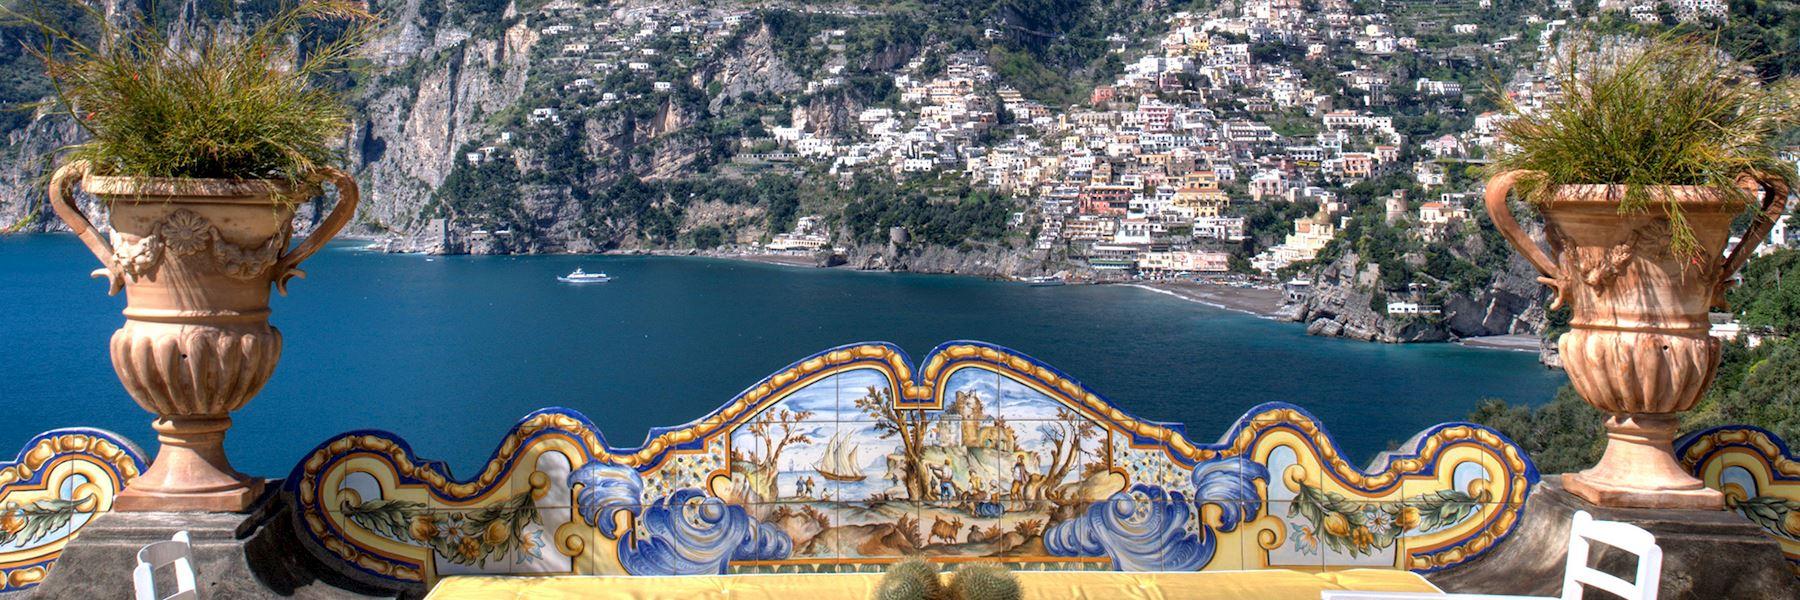 Il San Pietro Positano | Audley Travel